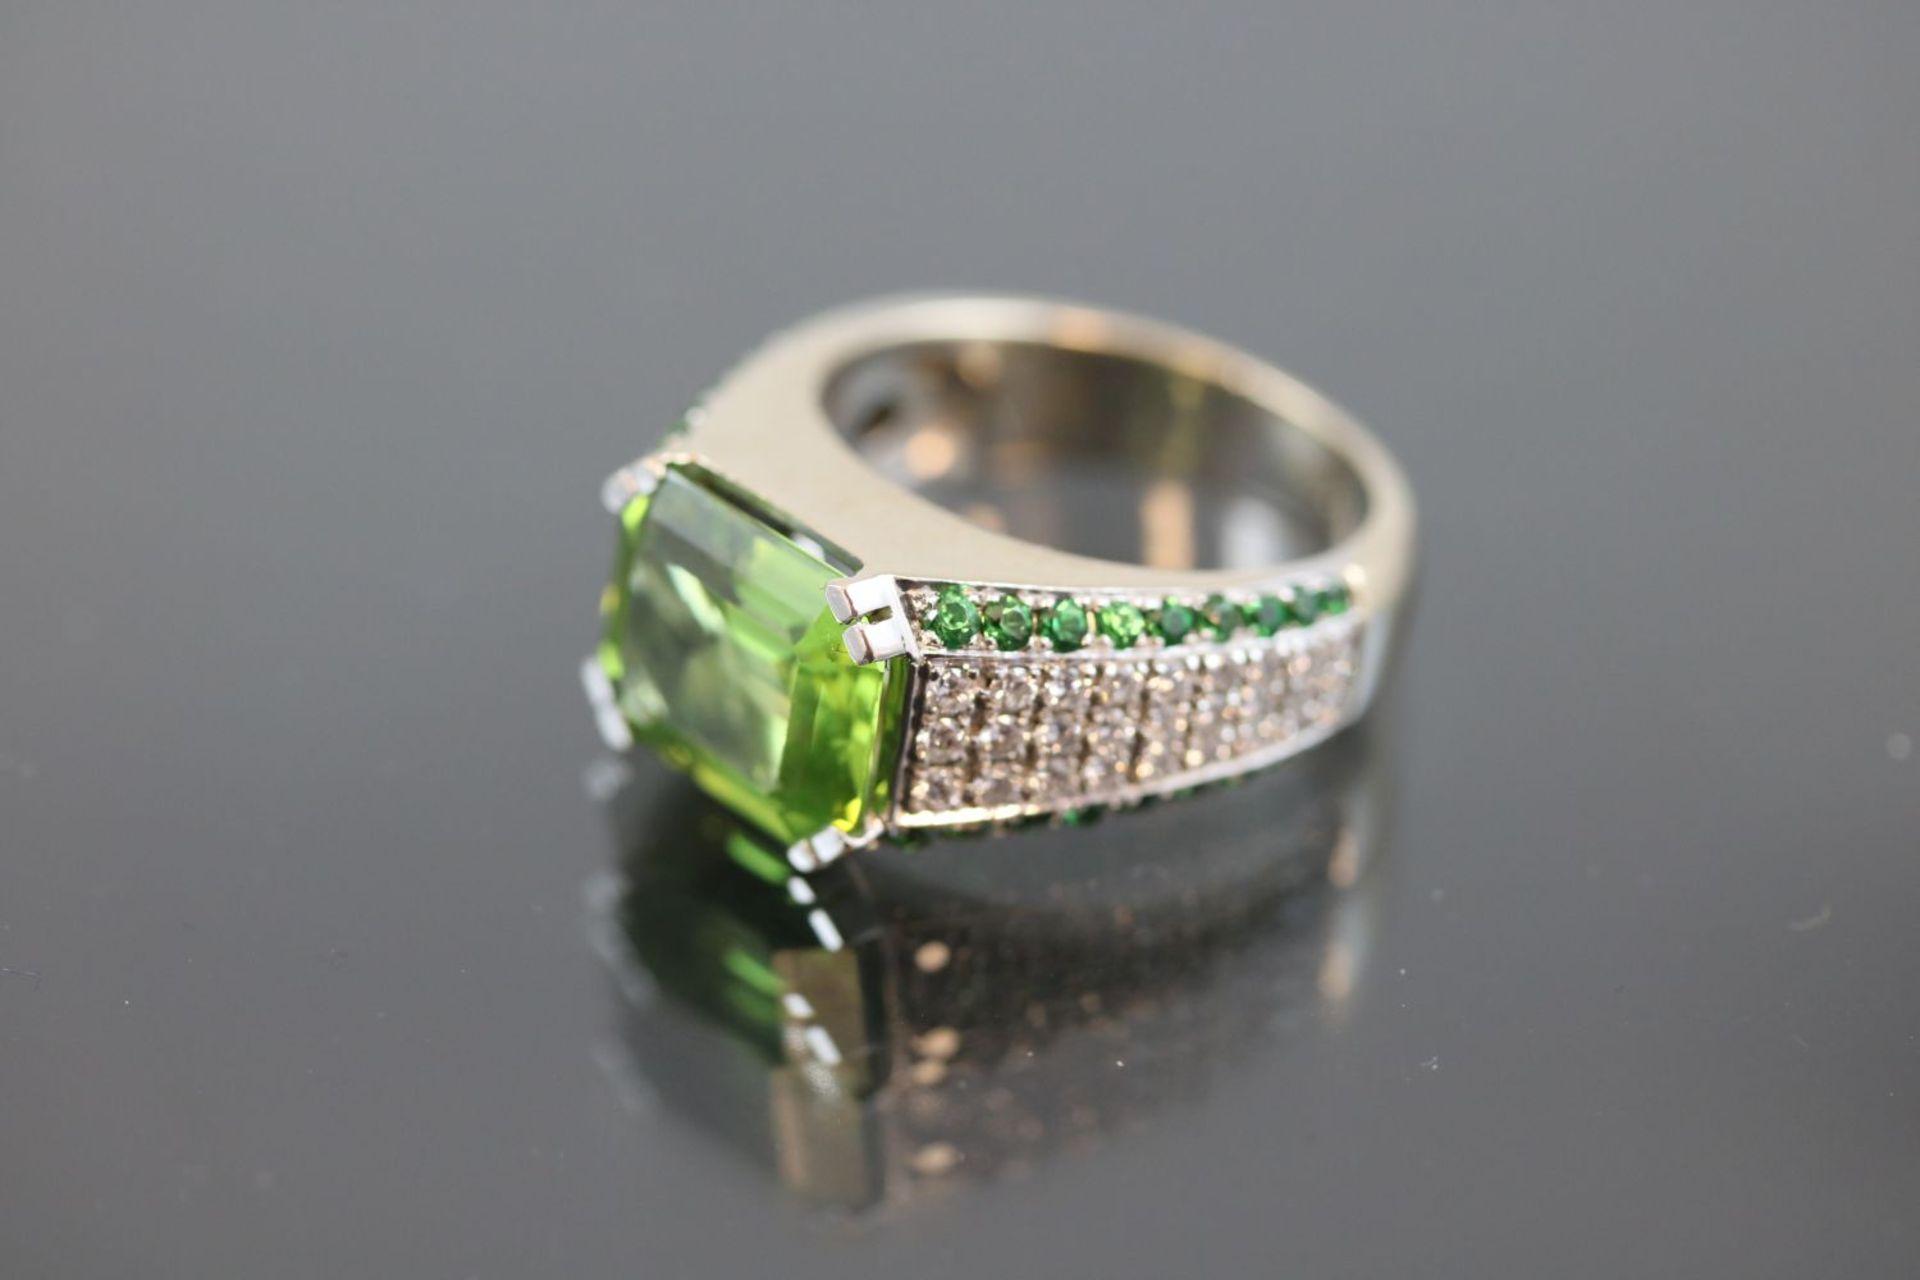 Los 19 - Peridot-Brillant-Tsavorit-Ring, 750 Weißgold12,7 Gramm 54 Brillanten, 0,65 ct., tw/vvsi.